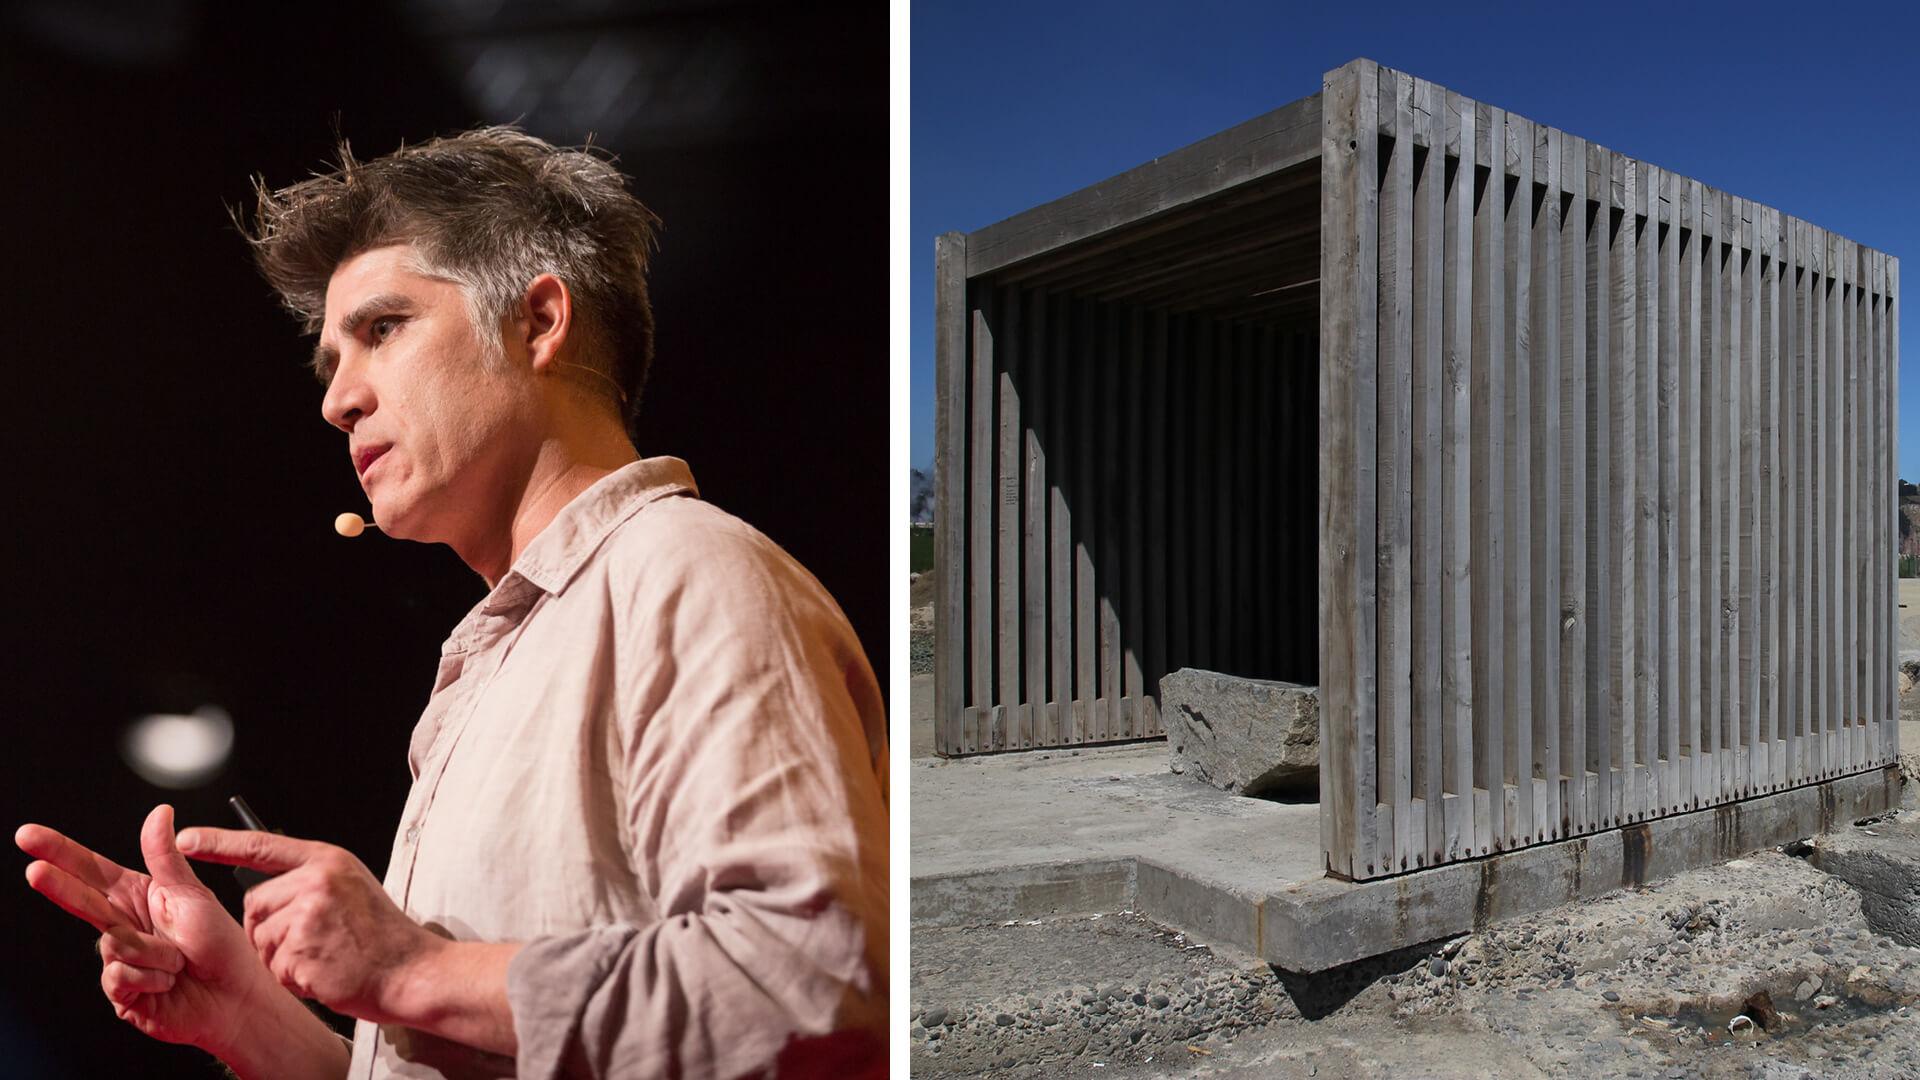 (L): Pritzker Prize laureate Alejandro Aravena giving a presentation, (R): Work underway at the Constitucion housing in Chile | Alejandro Aravena | Elemental | STIRworld